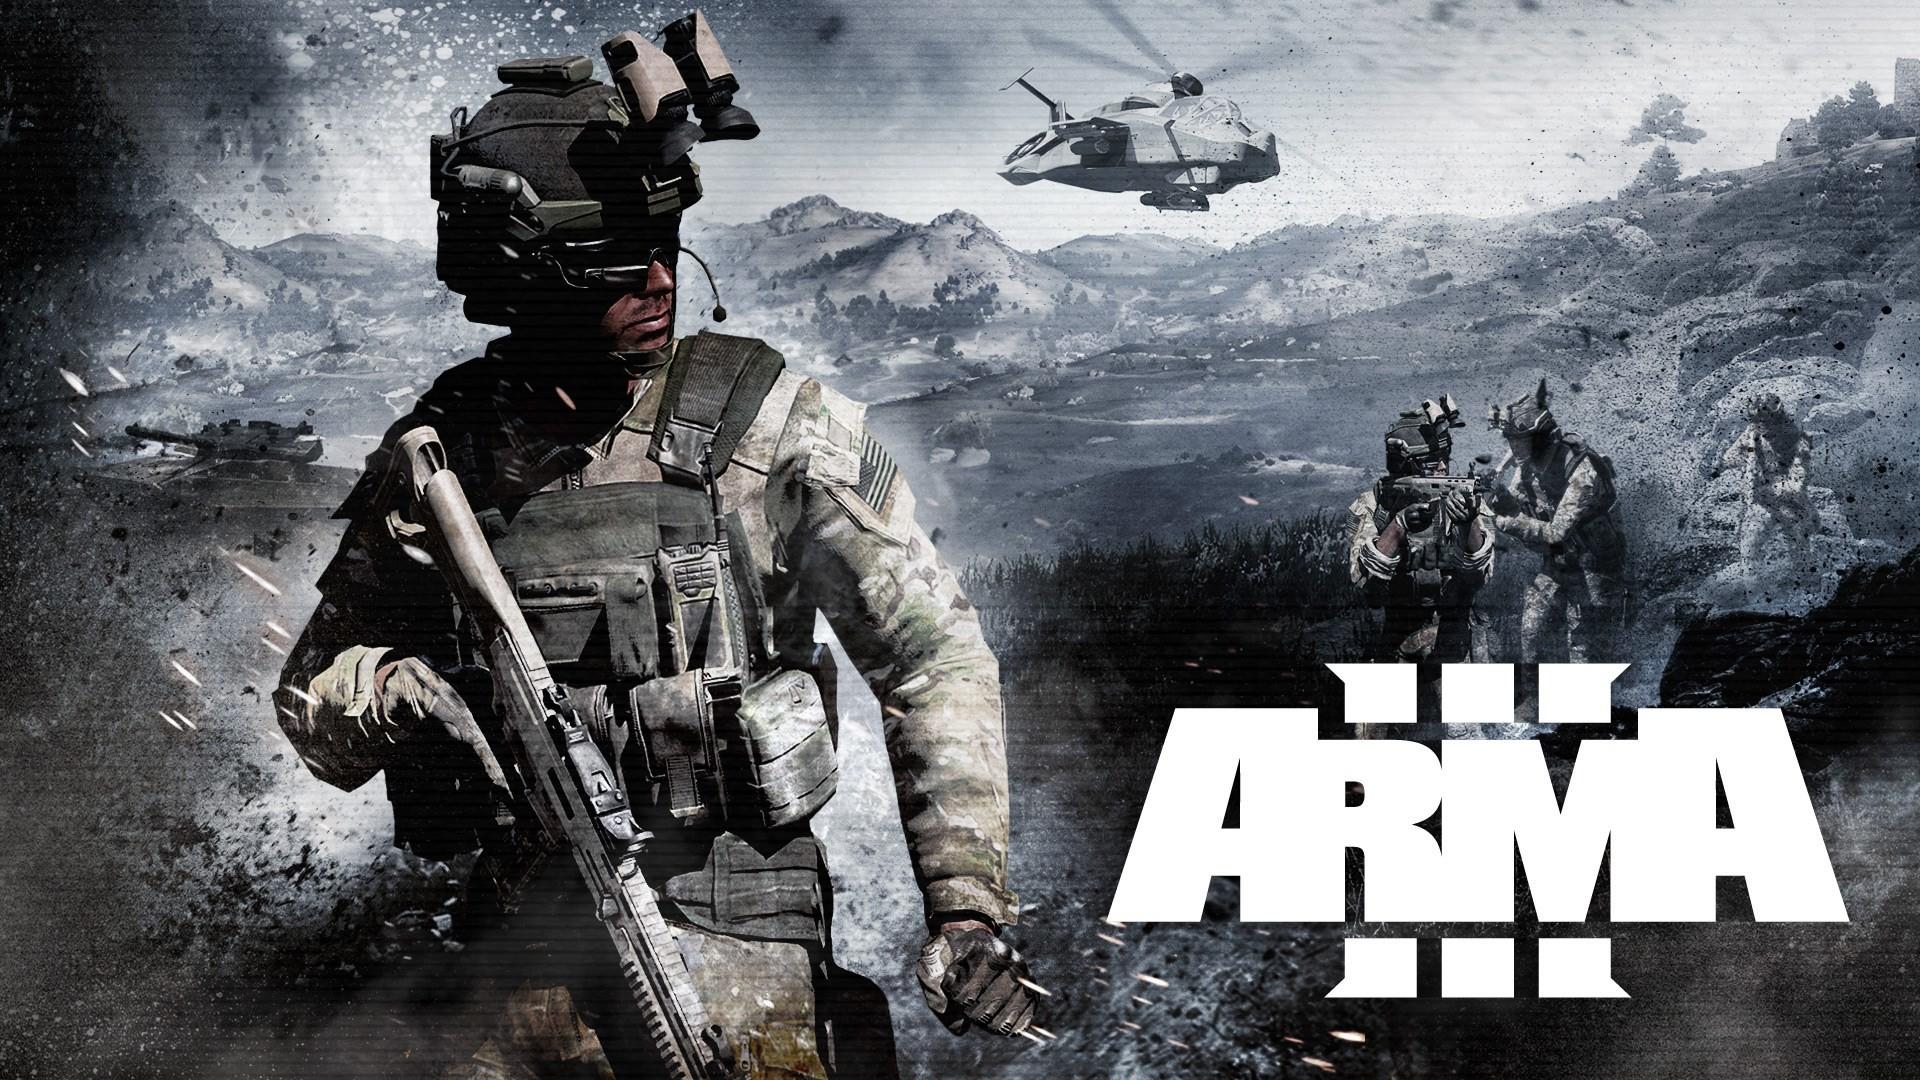 ArmA 3 wallpaper – Full HD Wallpapers, Photos – ArmA 3 category